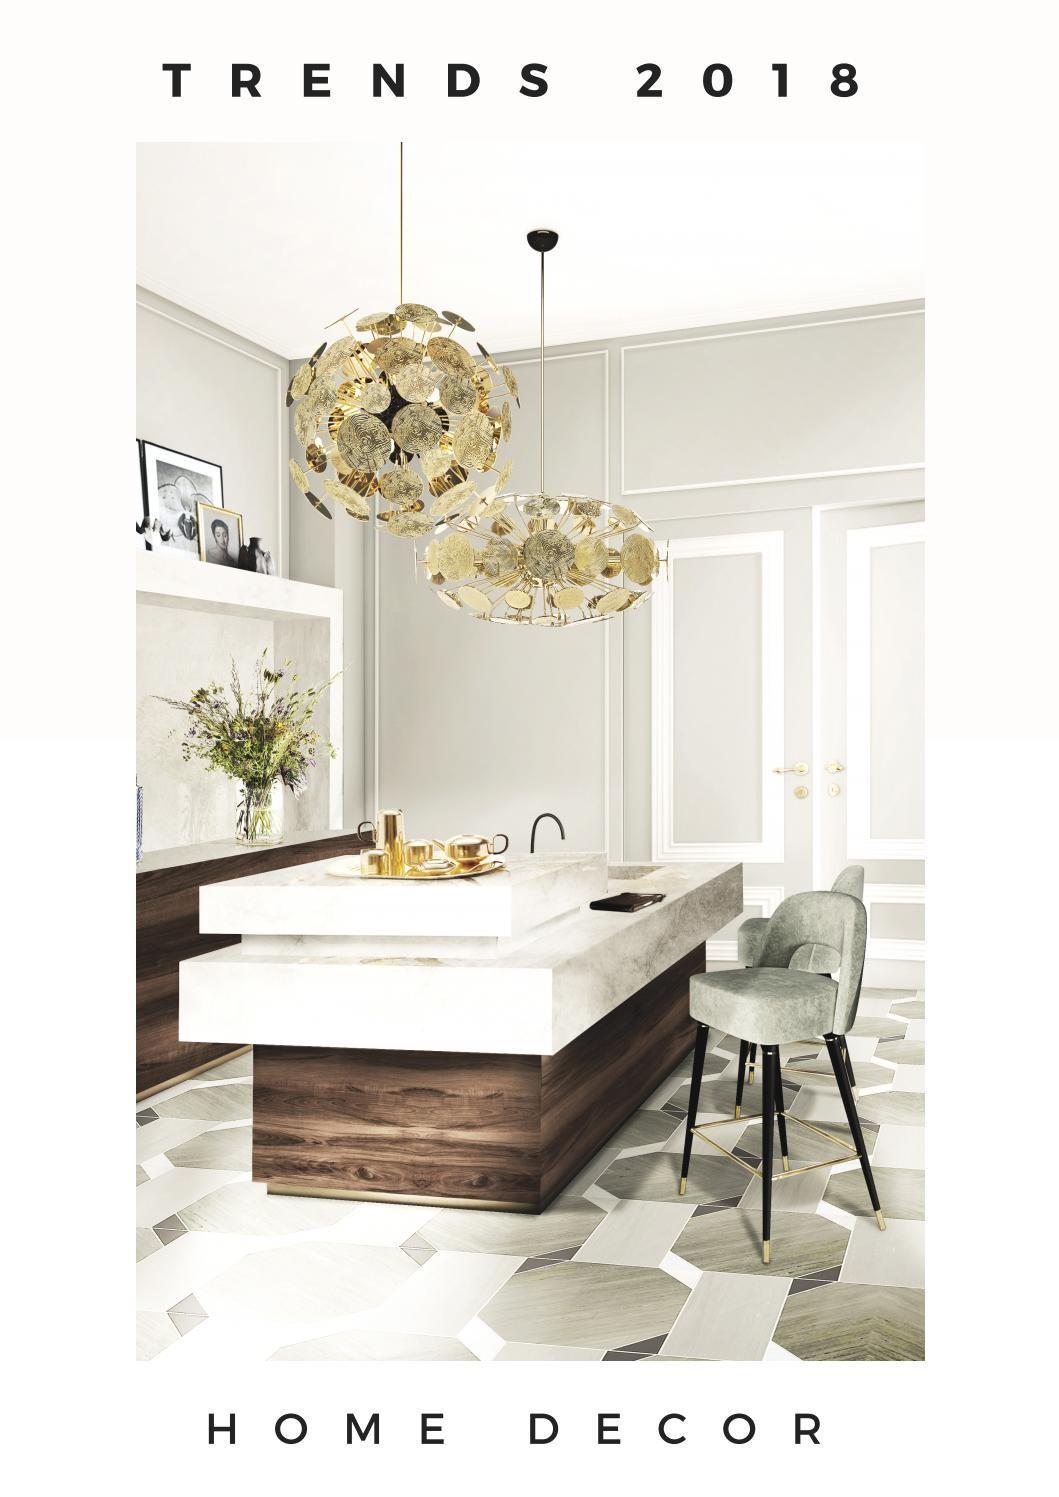 Home Decor Ideas Interior Design Trends 2018 Decoratorist 92253